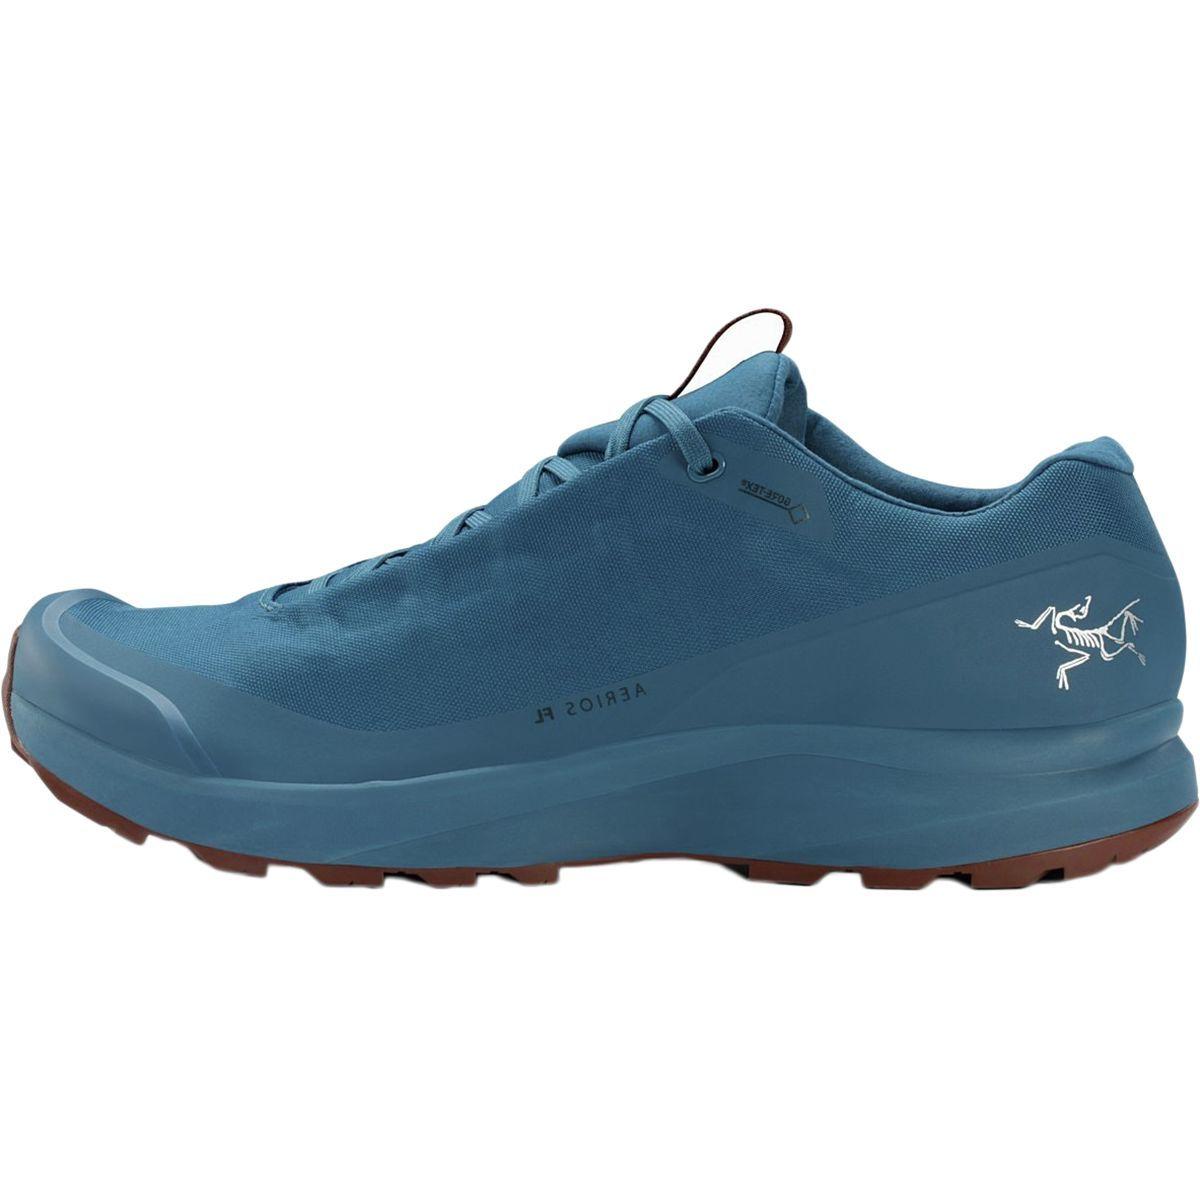 Arc'teryx Aerios FL GTX Hiking Shoe - Men's